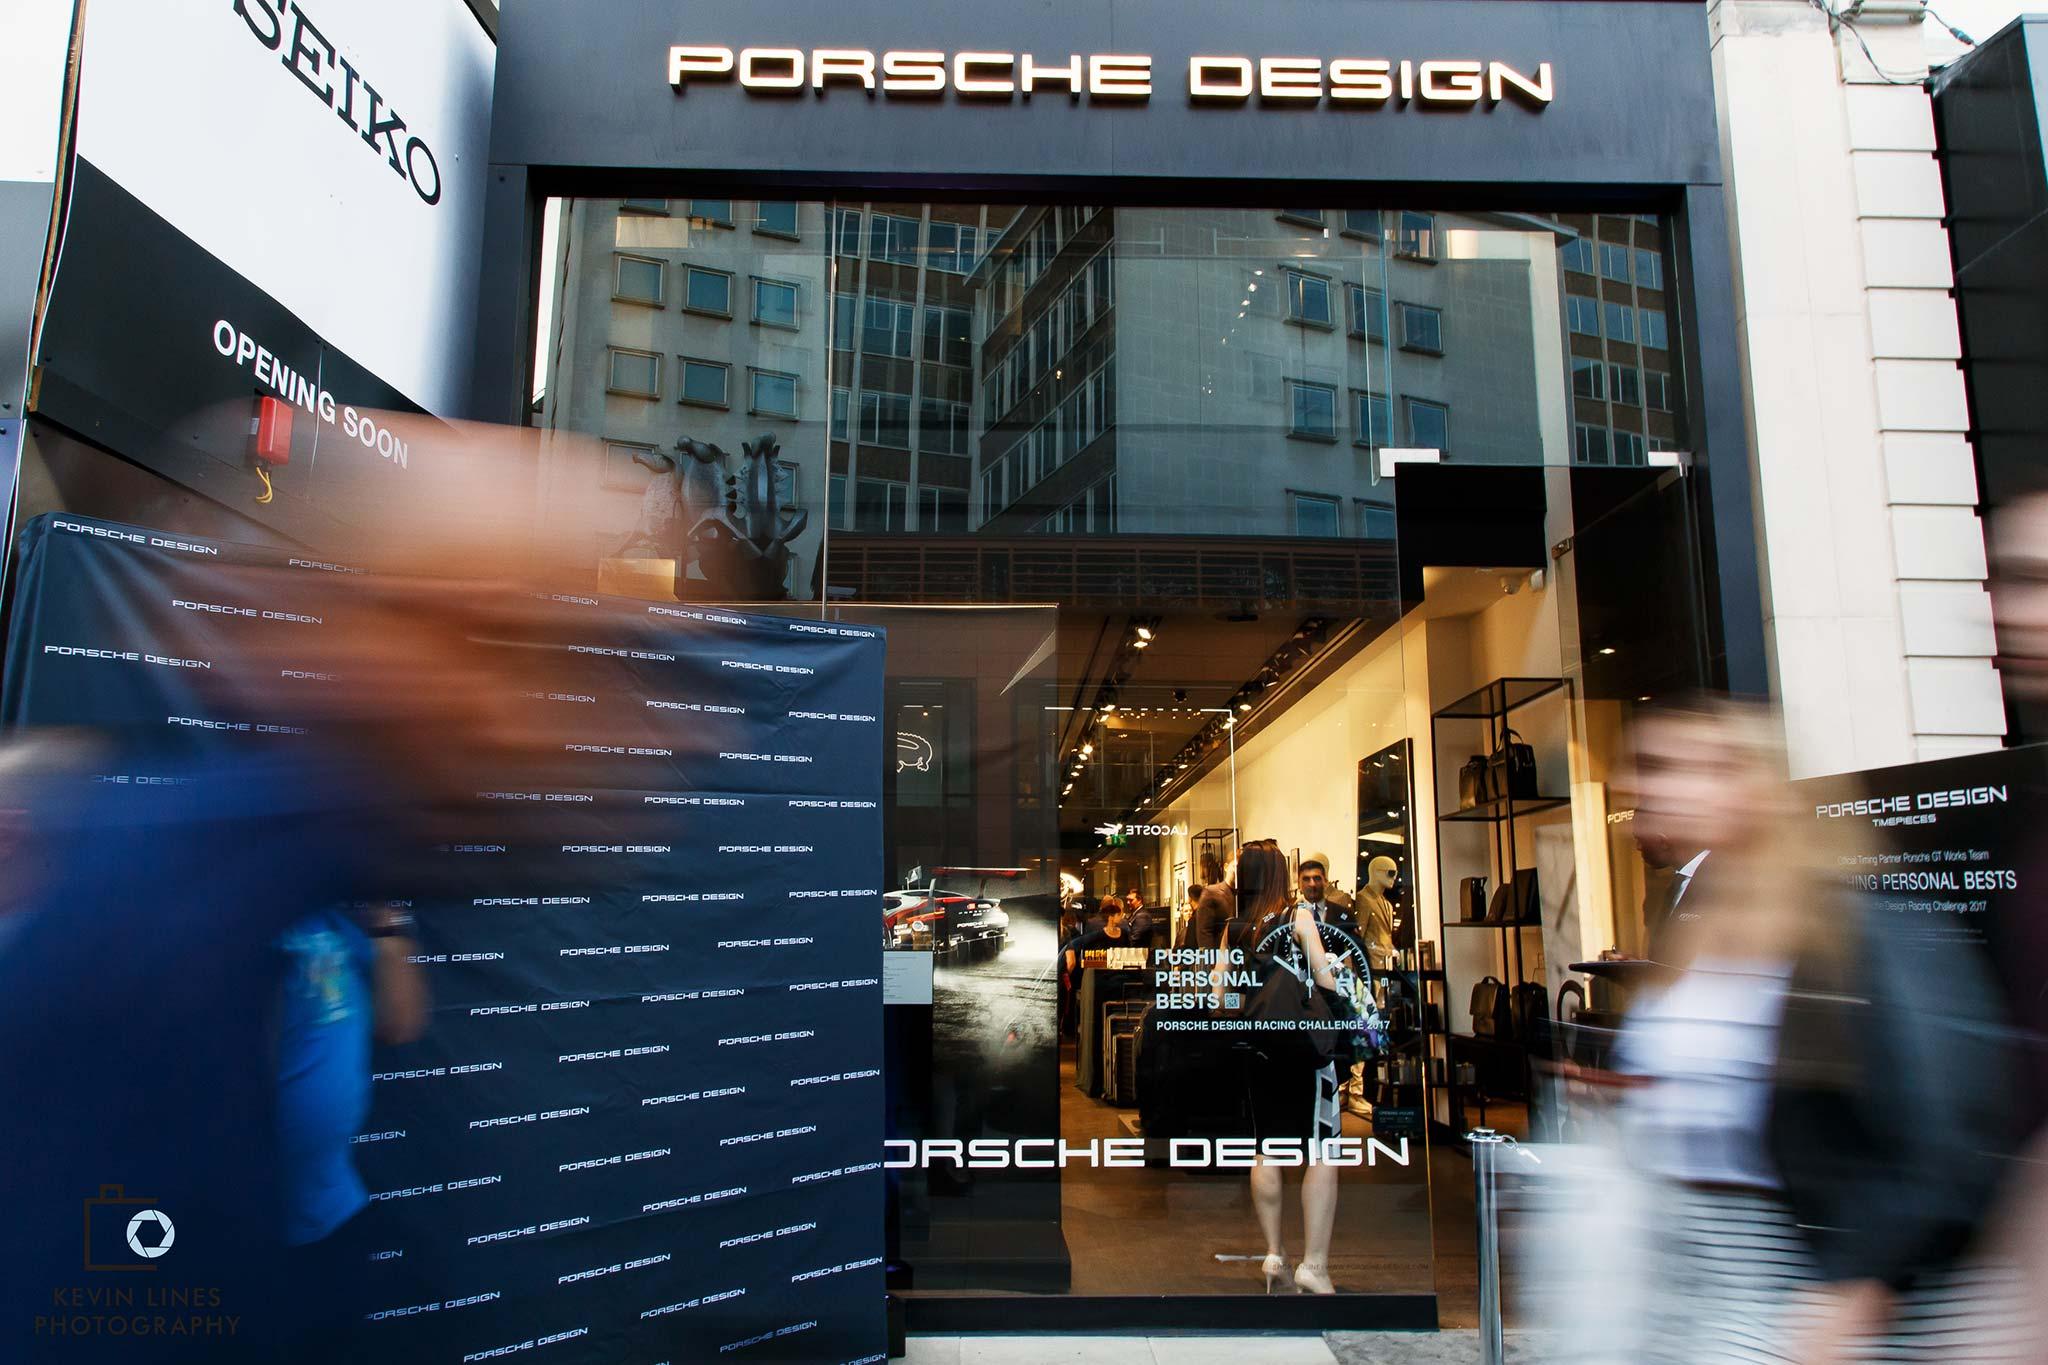 porsche-design-event-146.jpg